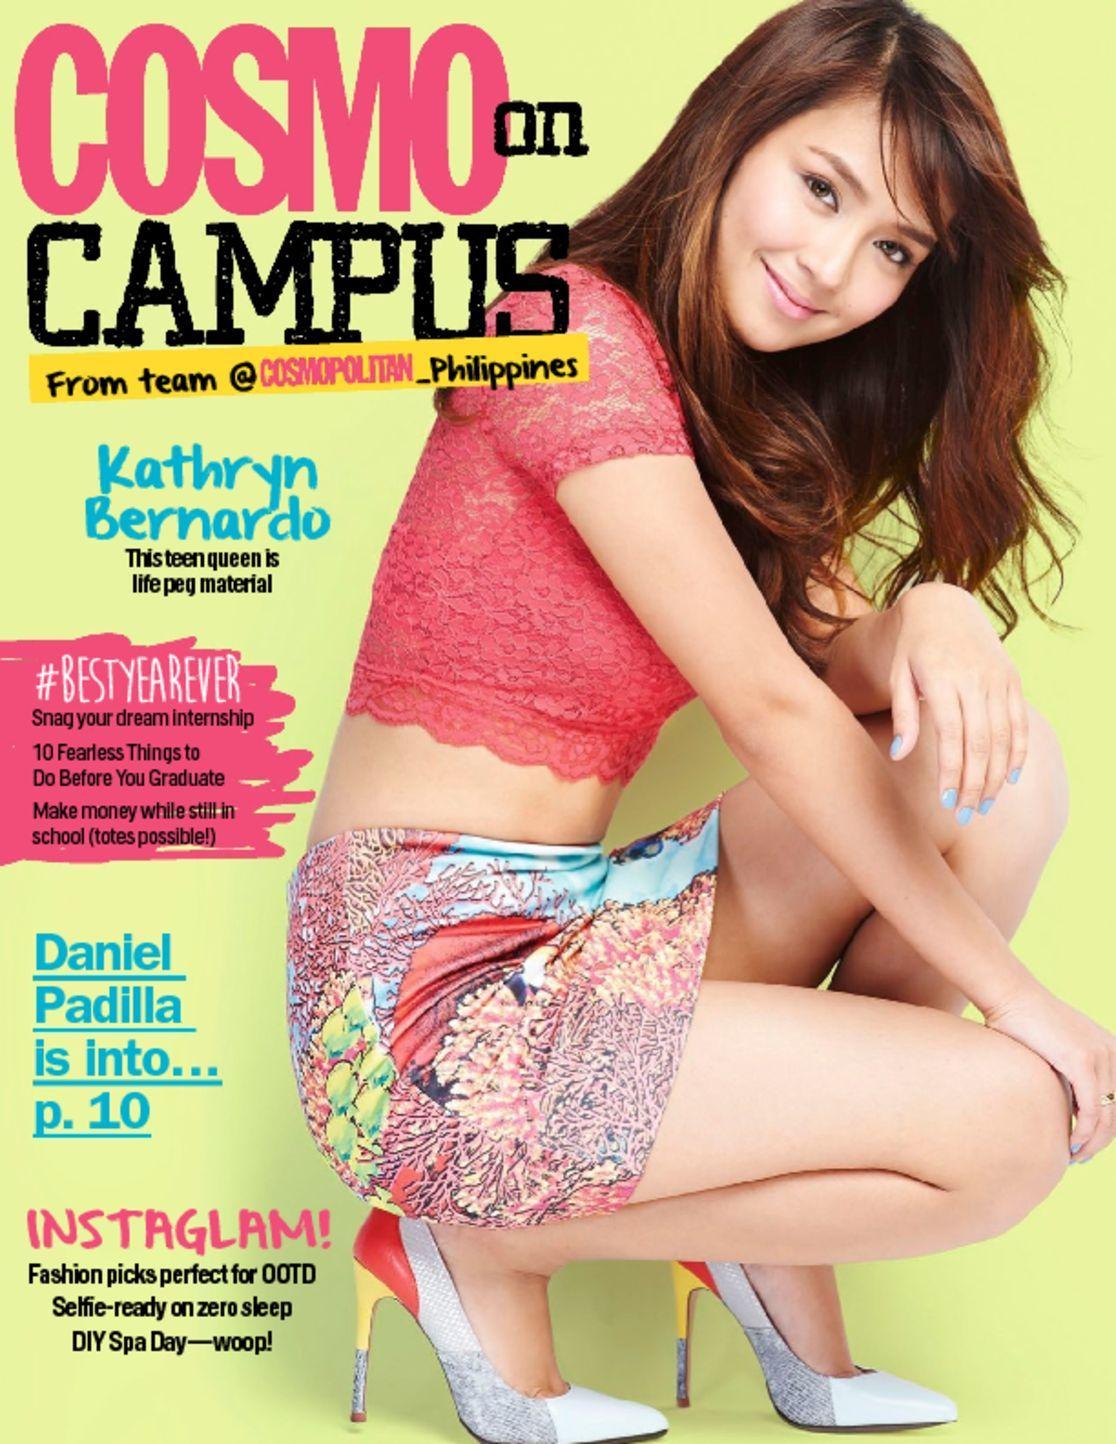 Cosmo on Campus Philippines Digital